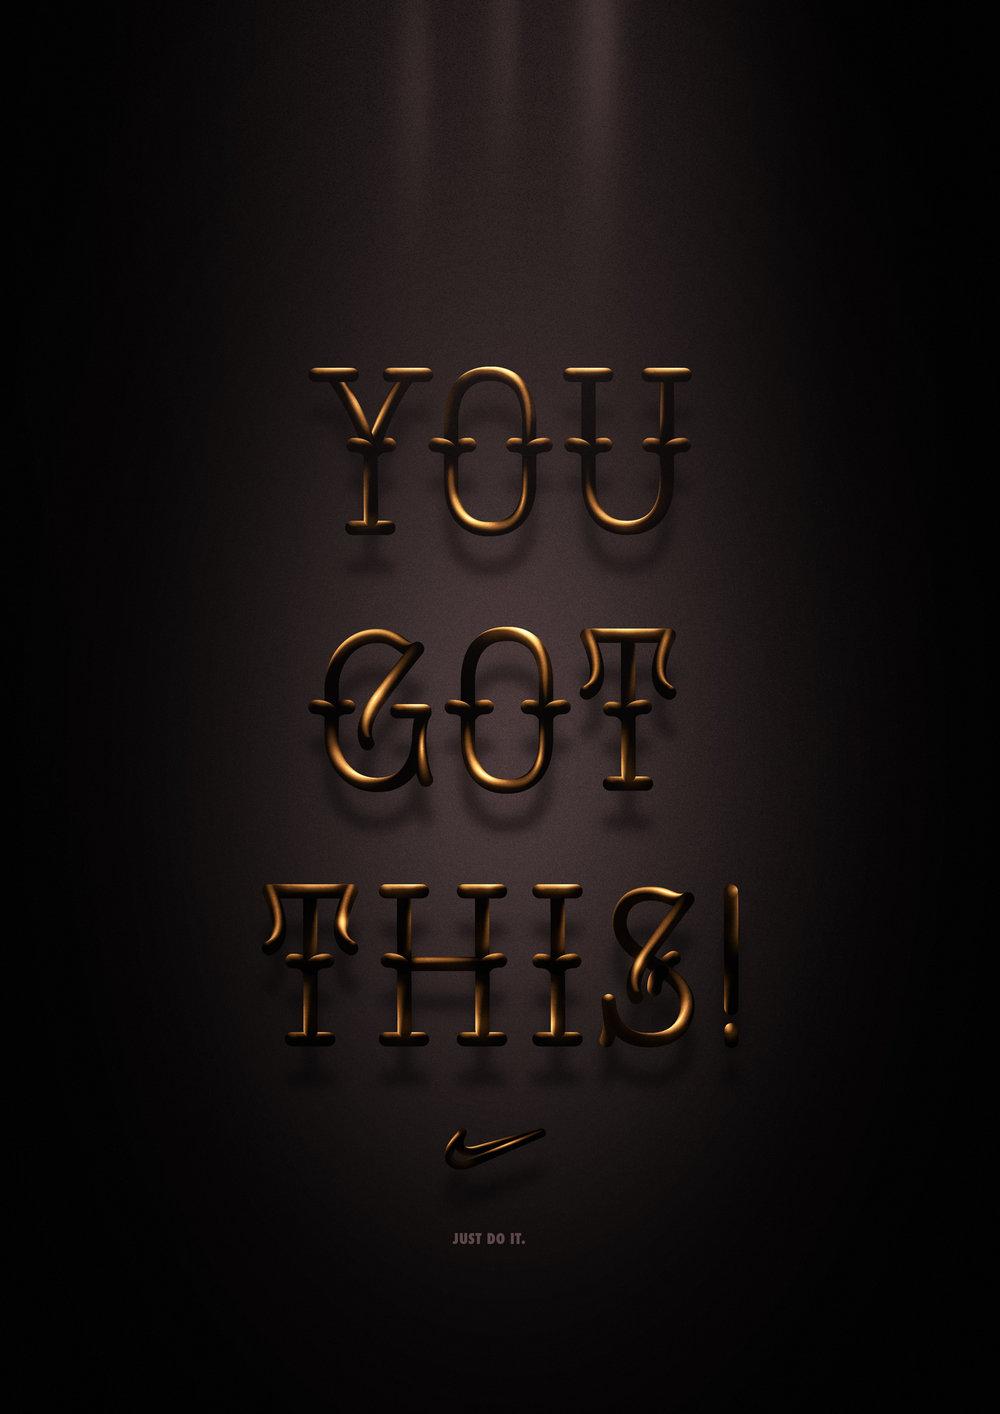 You-got-this_LR.jpg